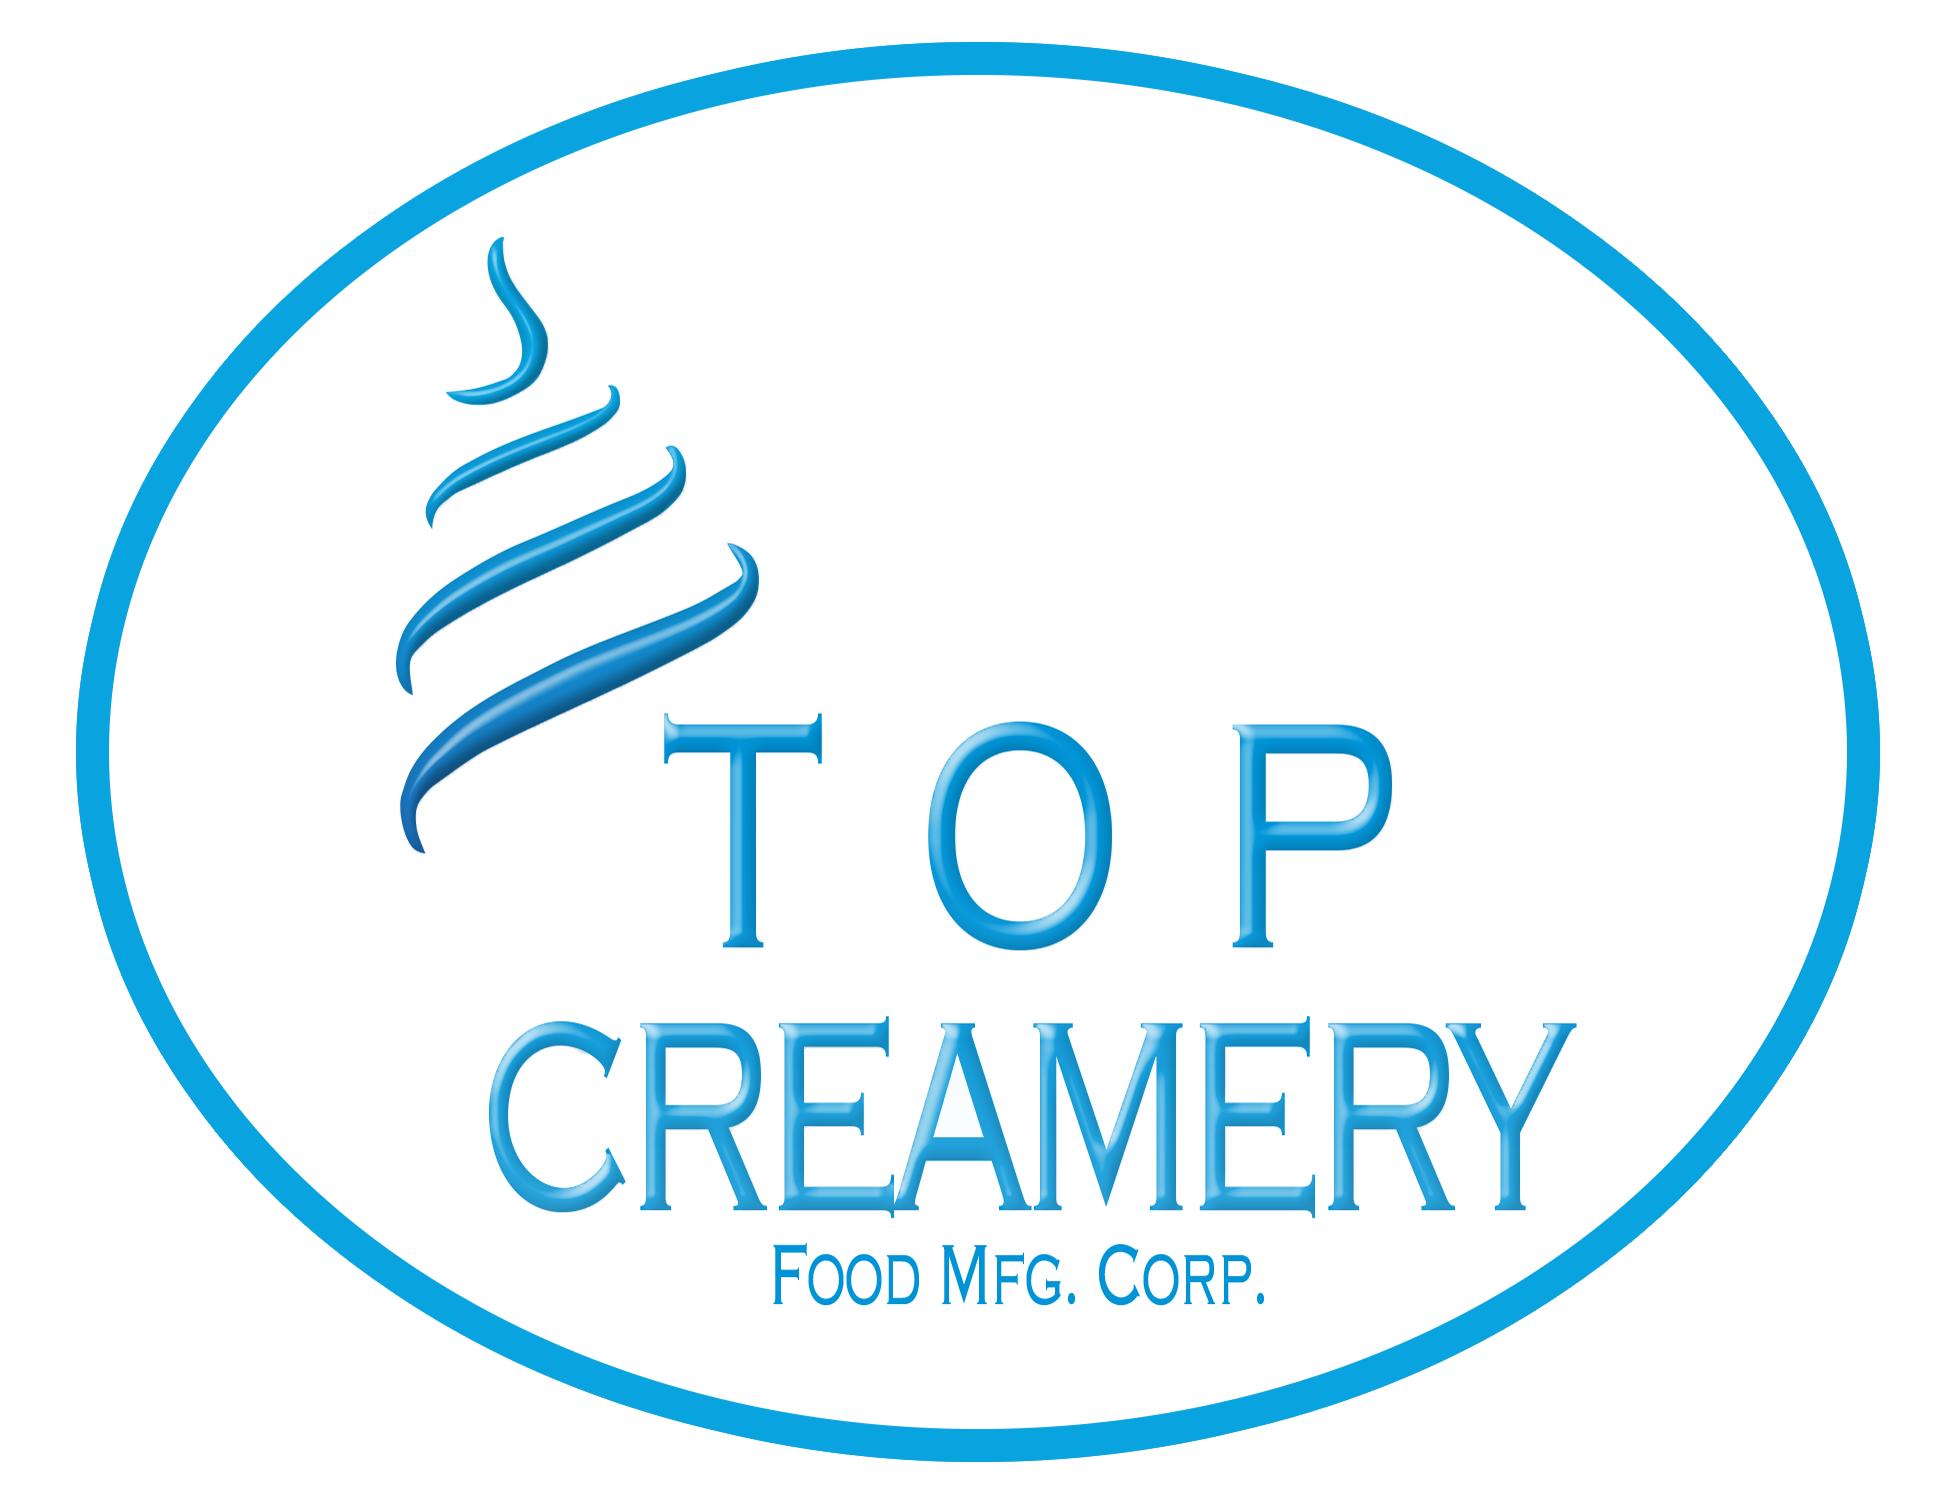 Top Creamery Food Mfg. Corp.